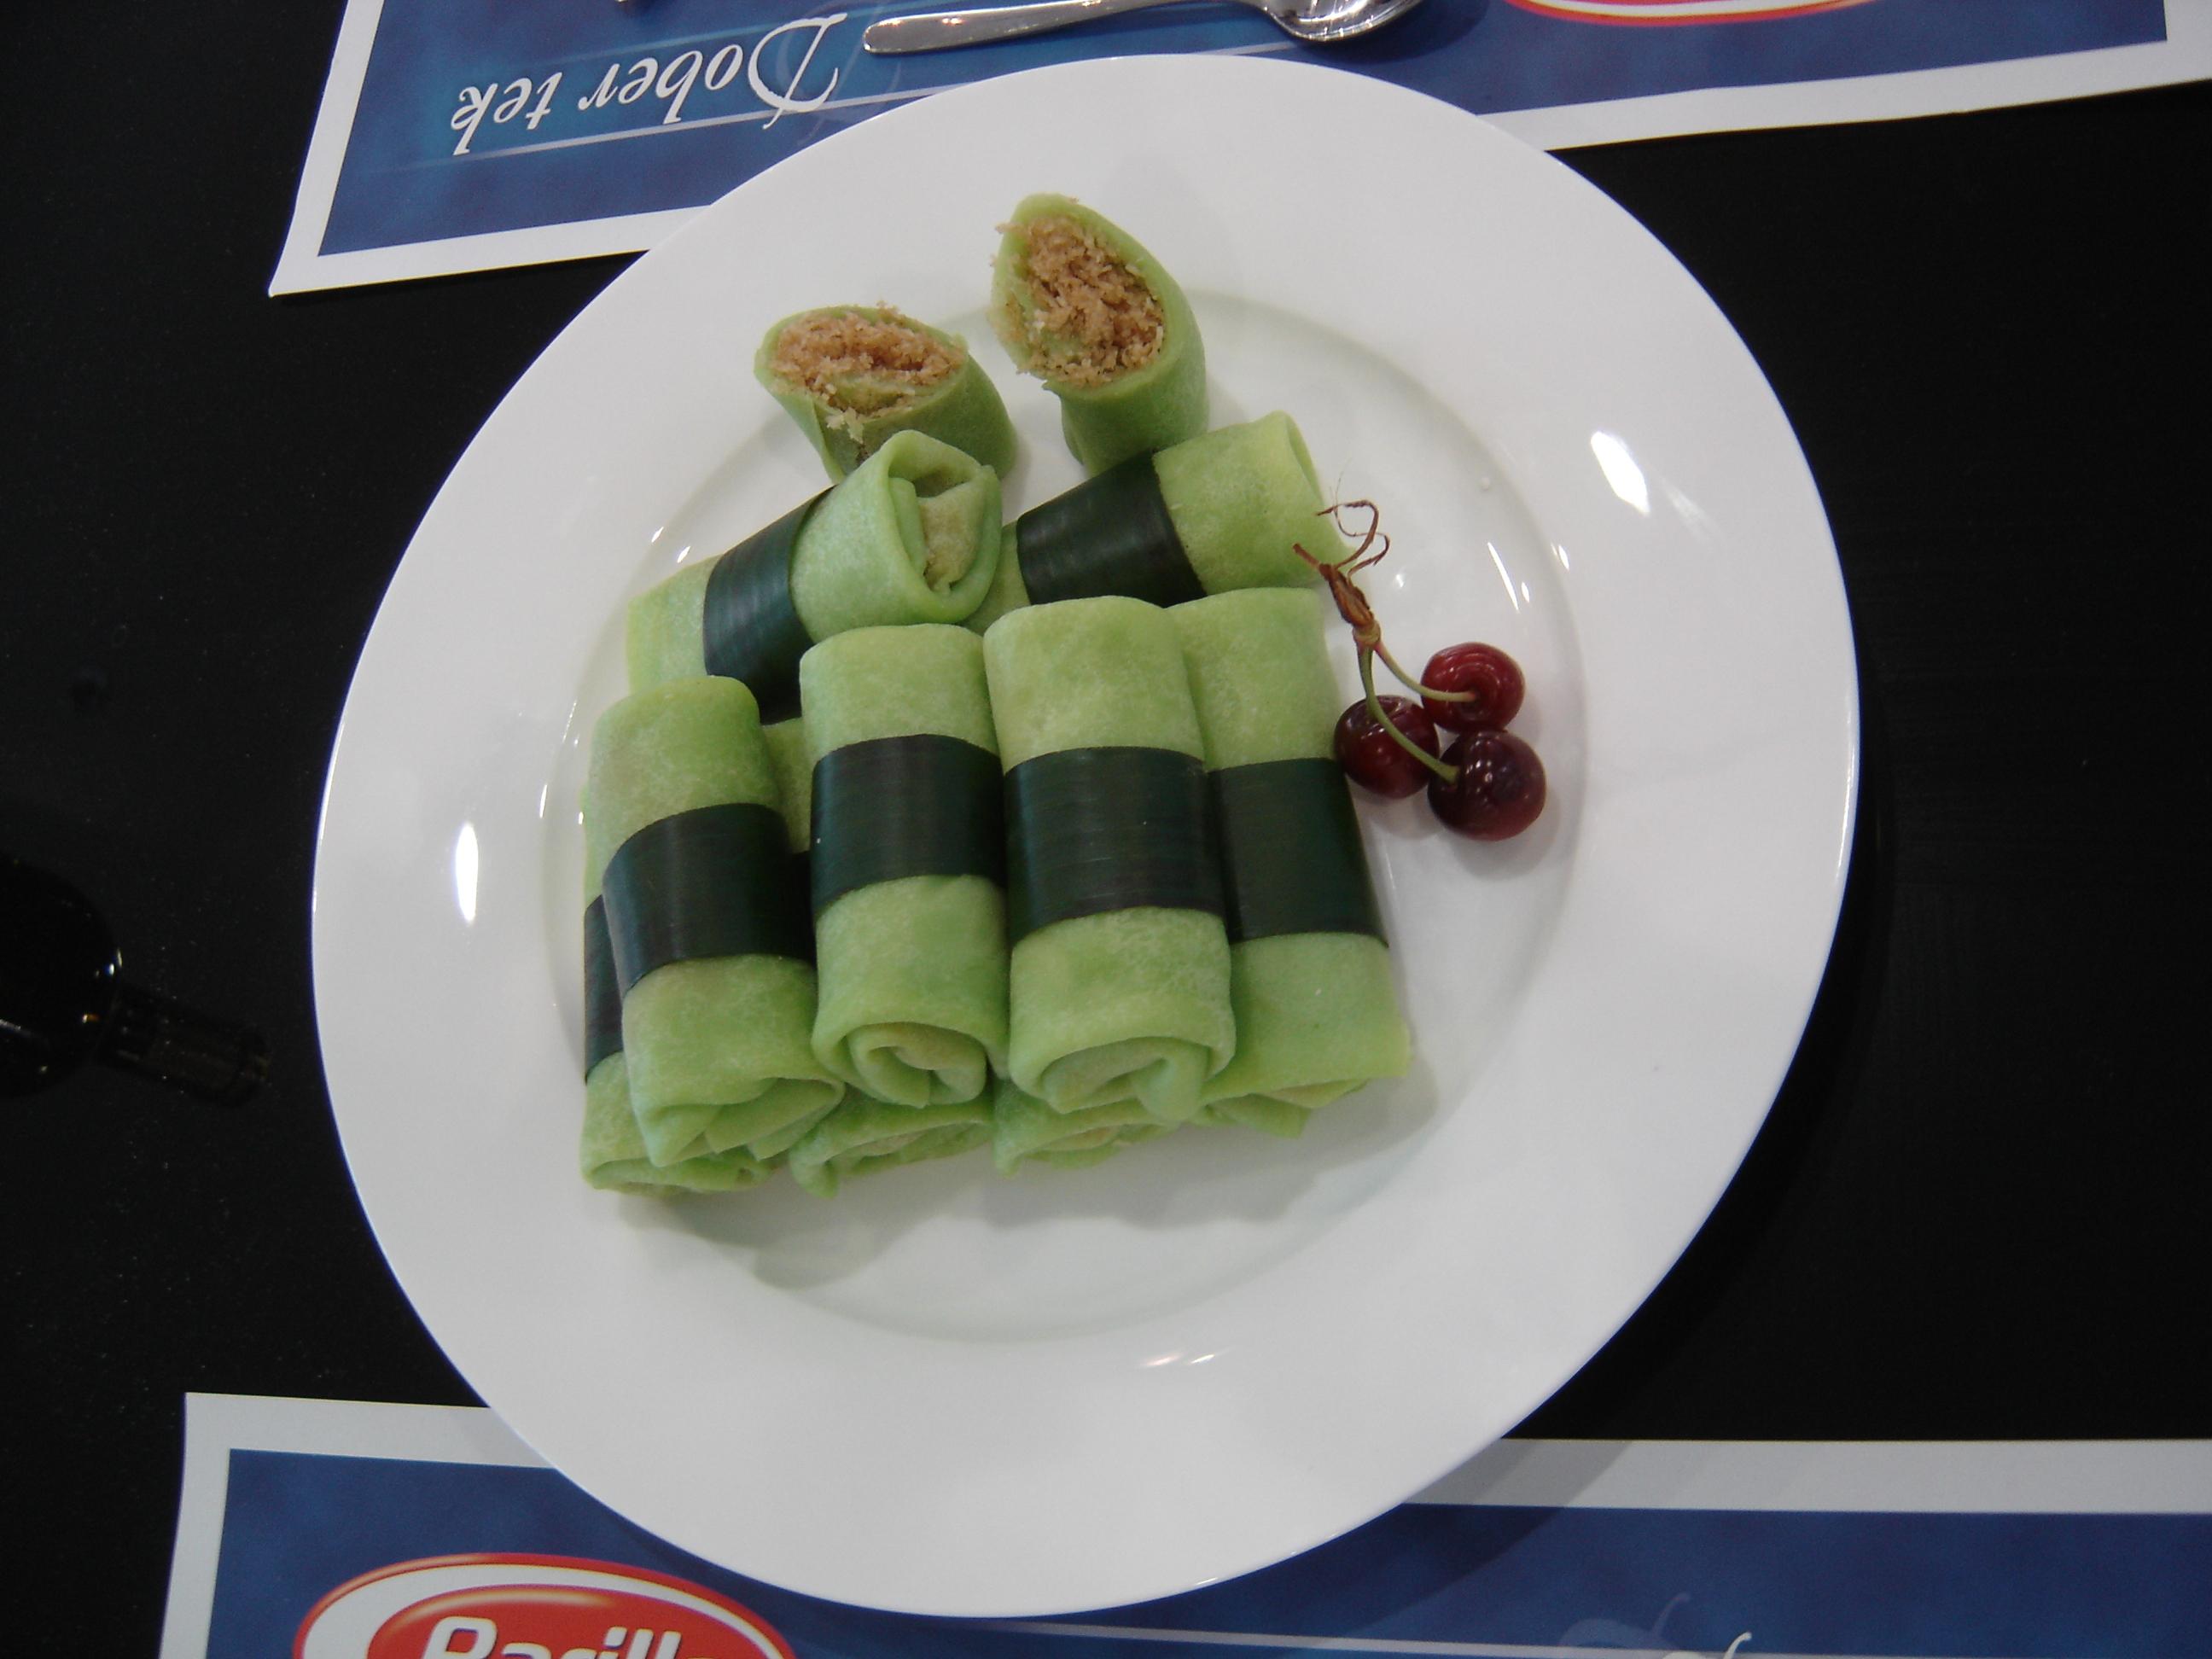 Tasty indonesian food dessert and sweet dadar gulung forumfinder Images